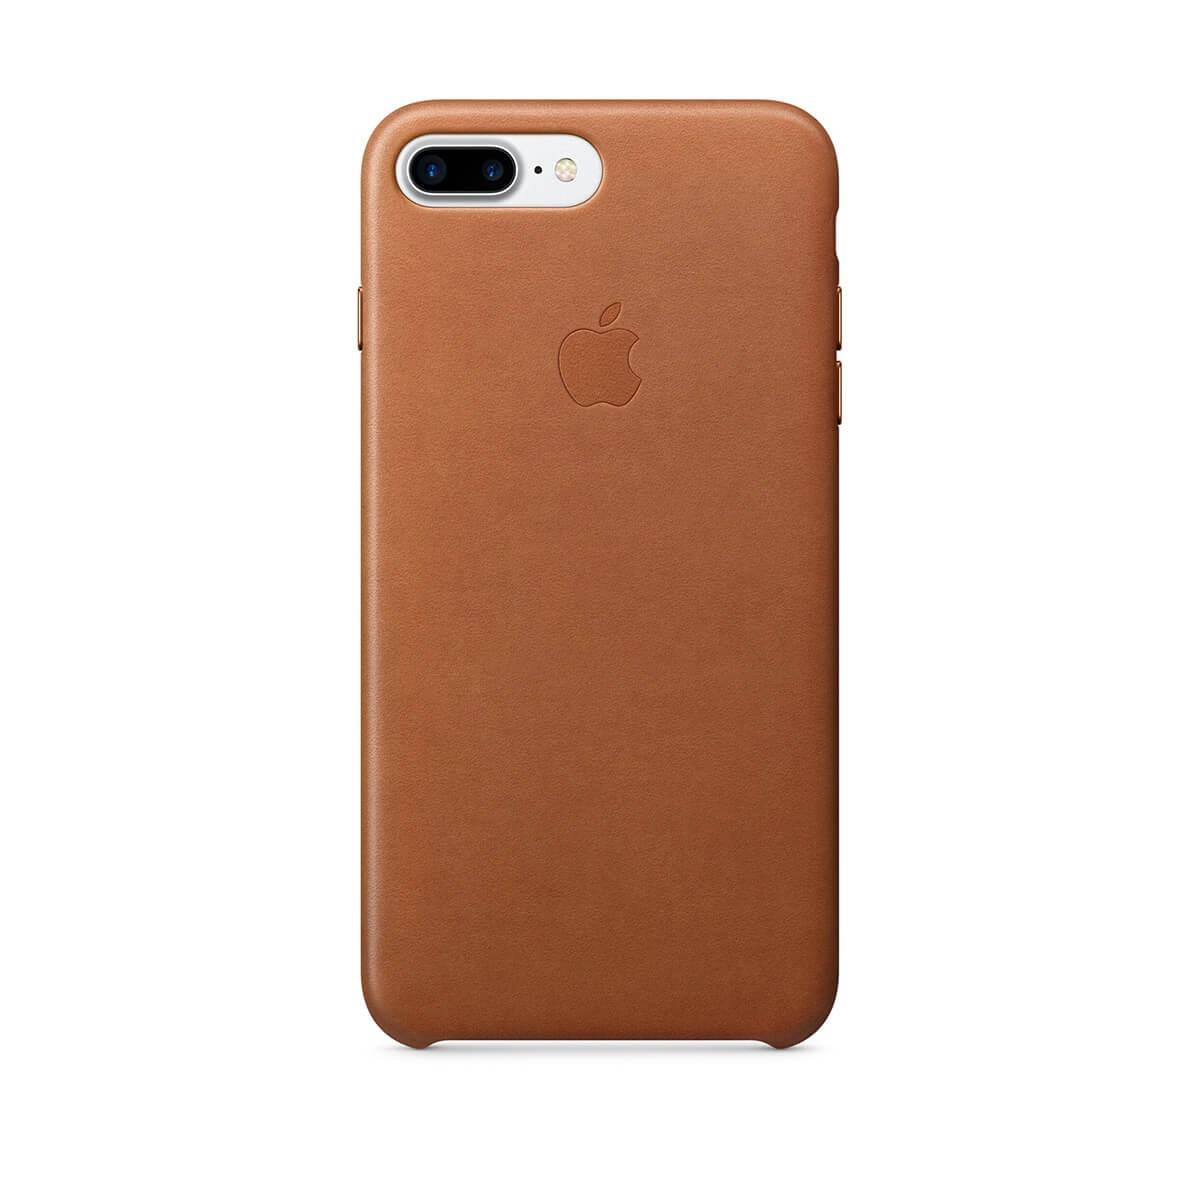 Apple kožený kryt na iPhone 7 Plus – sedlově hnědý